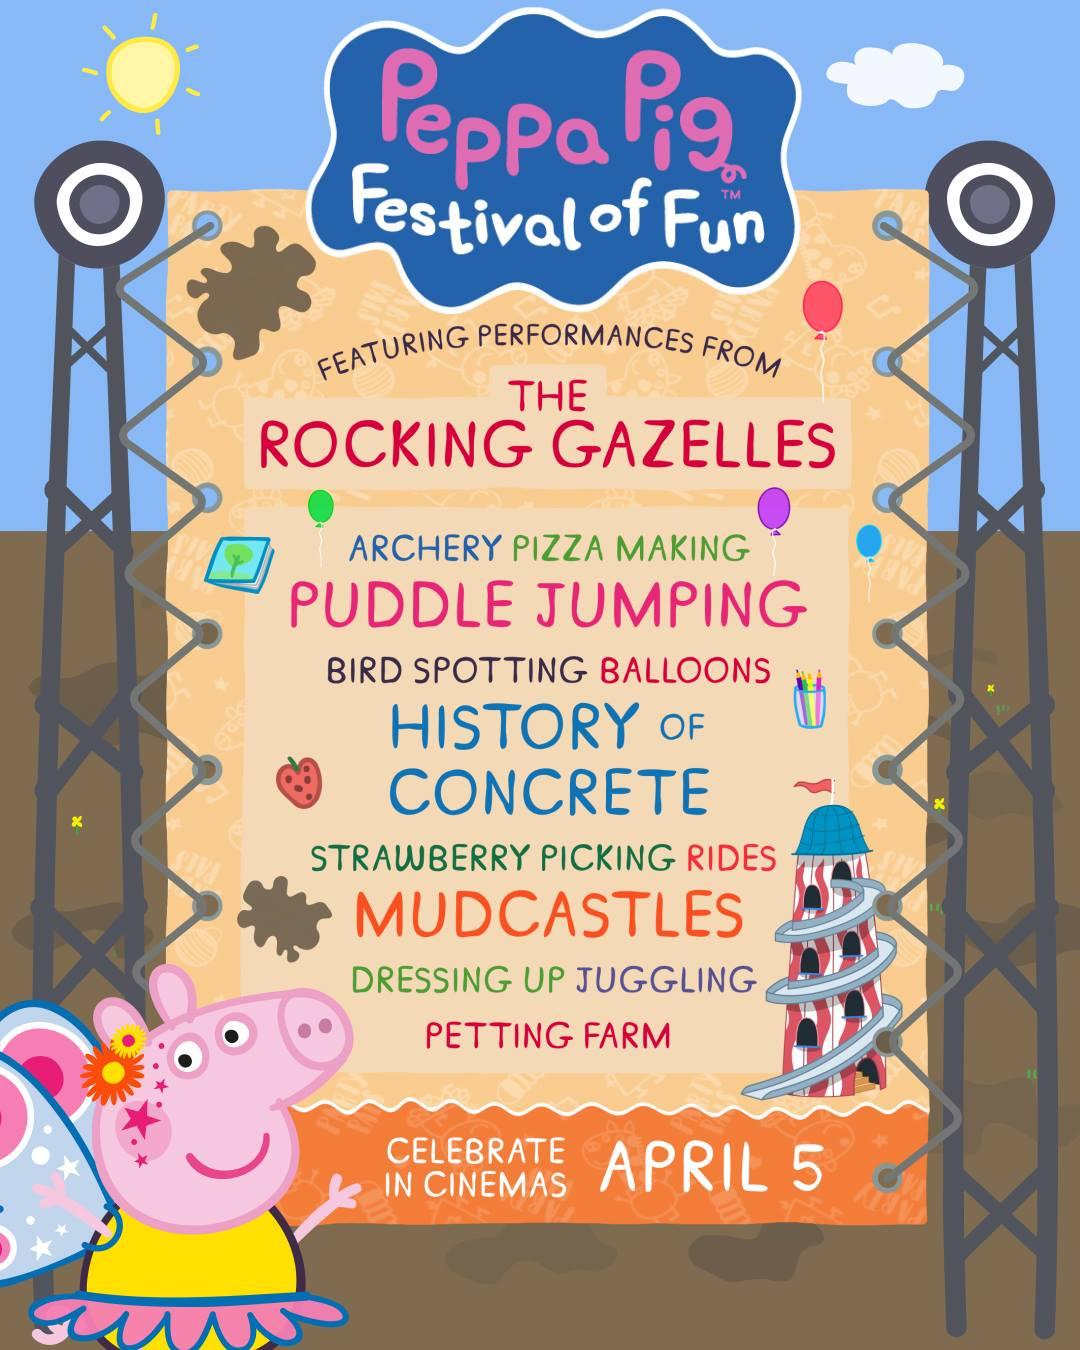 Peppa Pig Festival Of Fun 2019